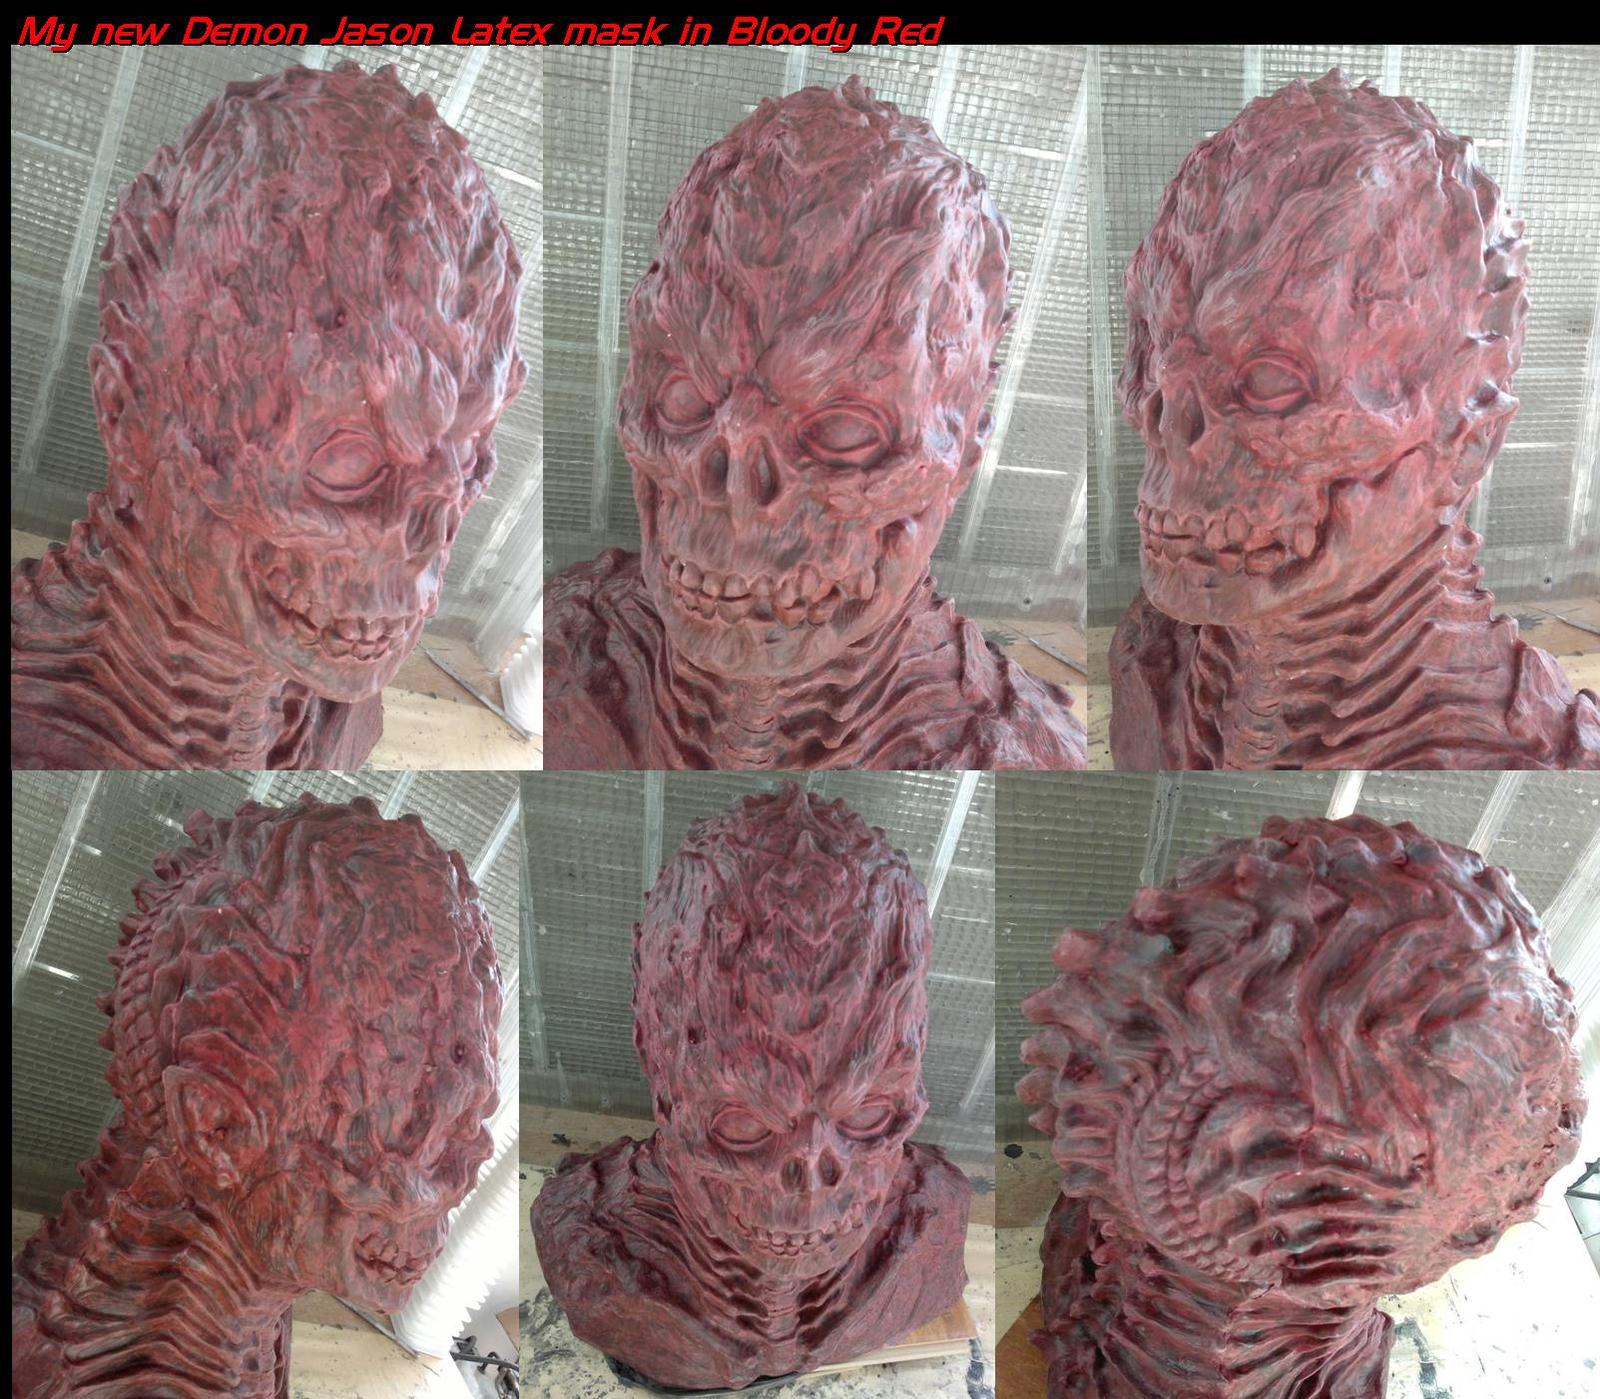 Demon blood jason latex hood by uratz studios on deviantart - Uratz studios ...